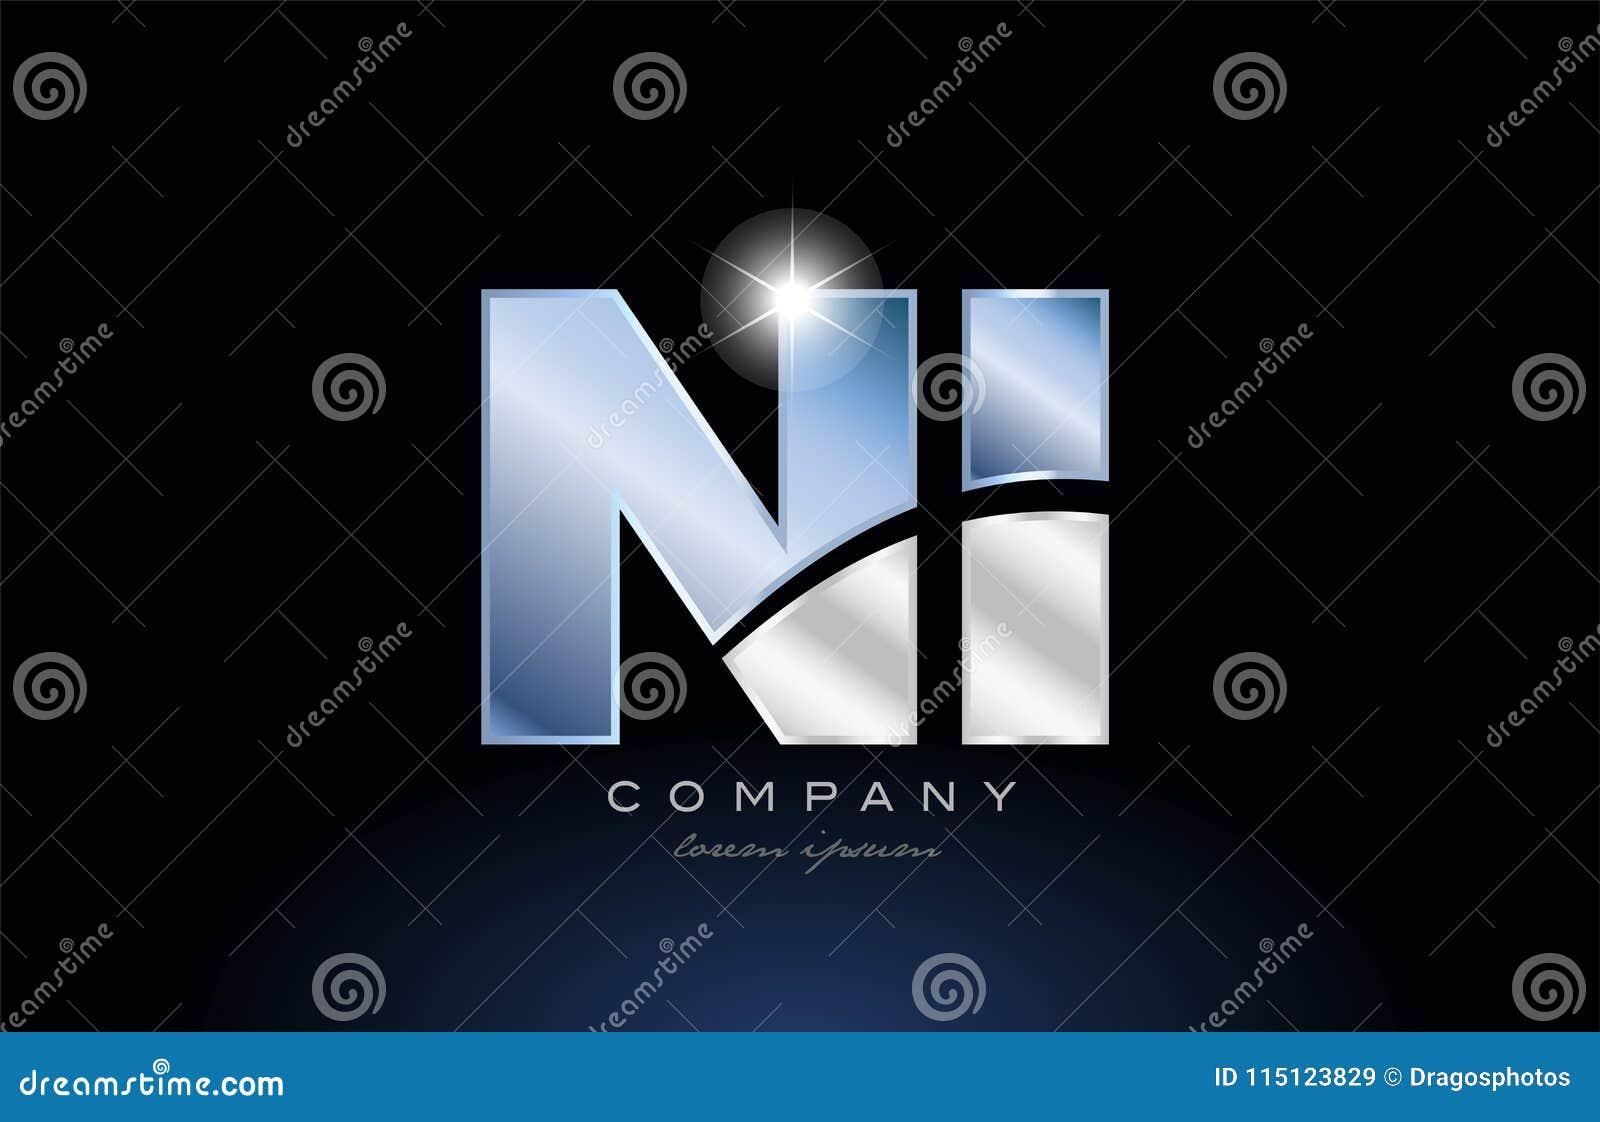 metal blue alphabet letter ni n i logo company icon design